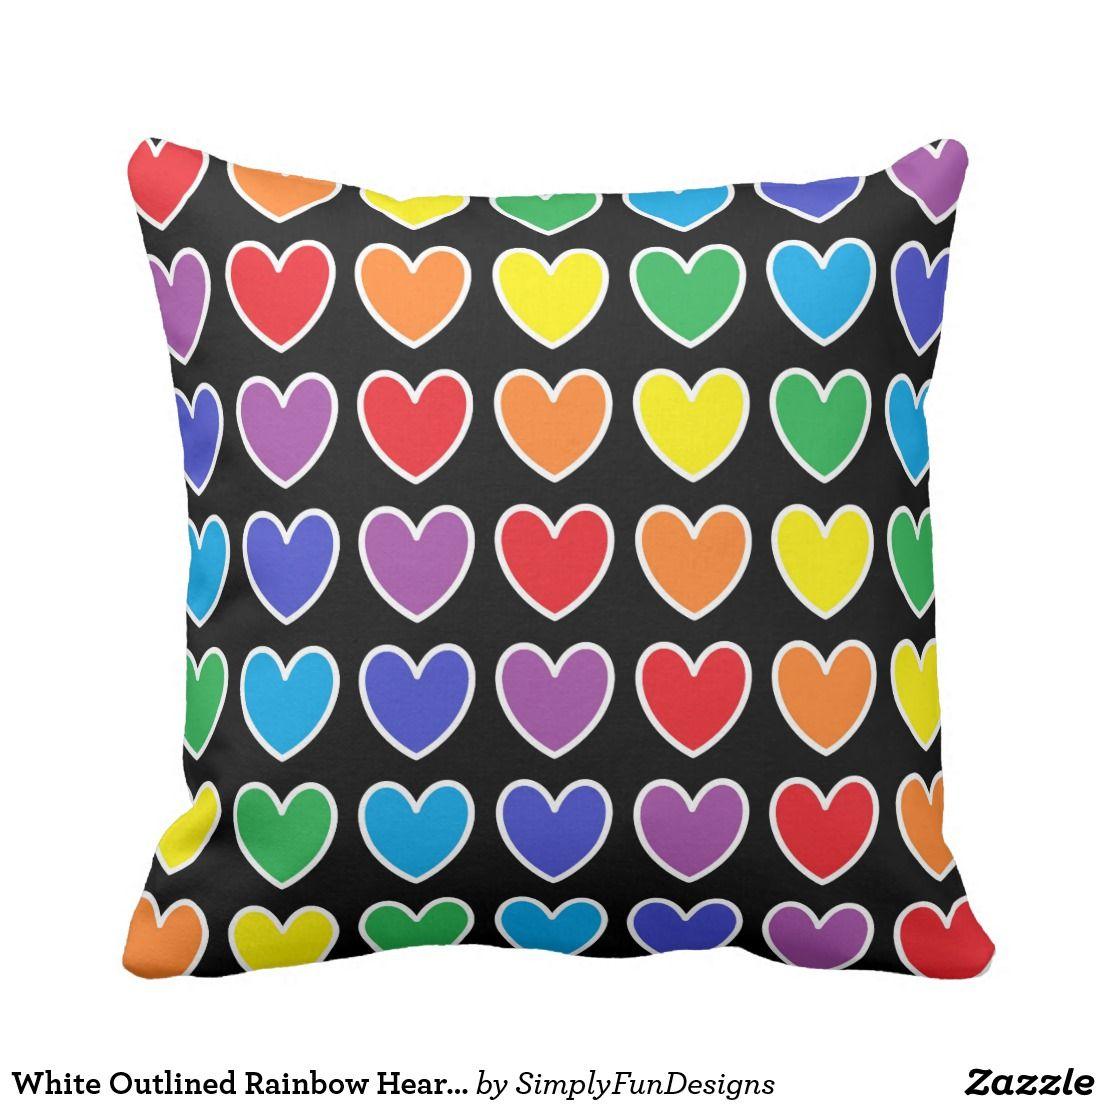 White Outlined Rainbow Hearts Throw Pillow Pillow Throwpillow Decorative Homedecor Interiordesign Throw Pillows Pillows Custom Throw Pillow